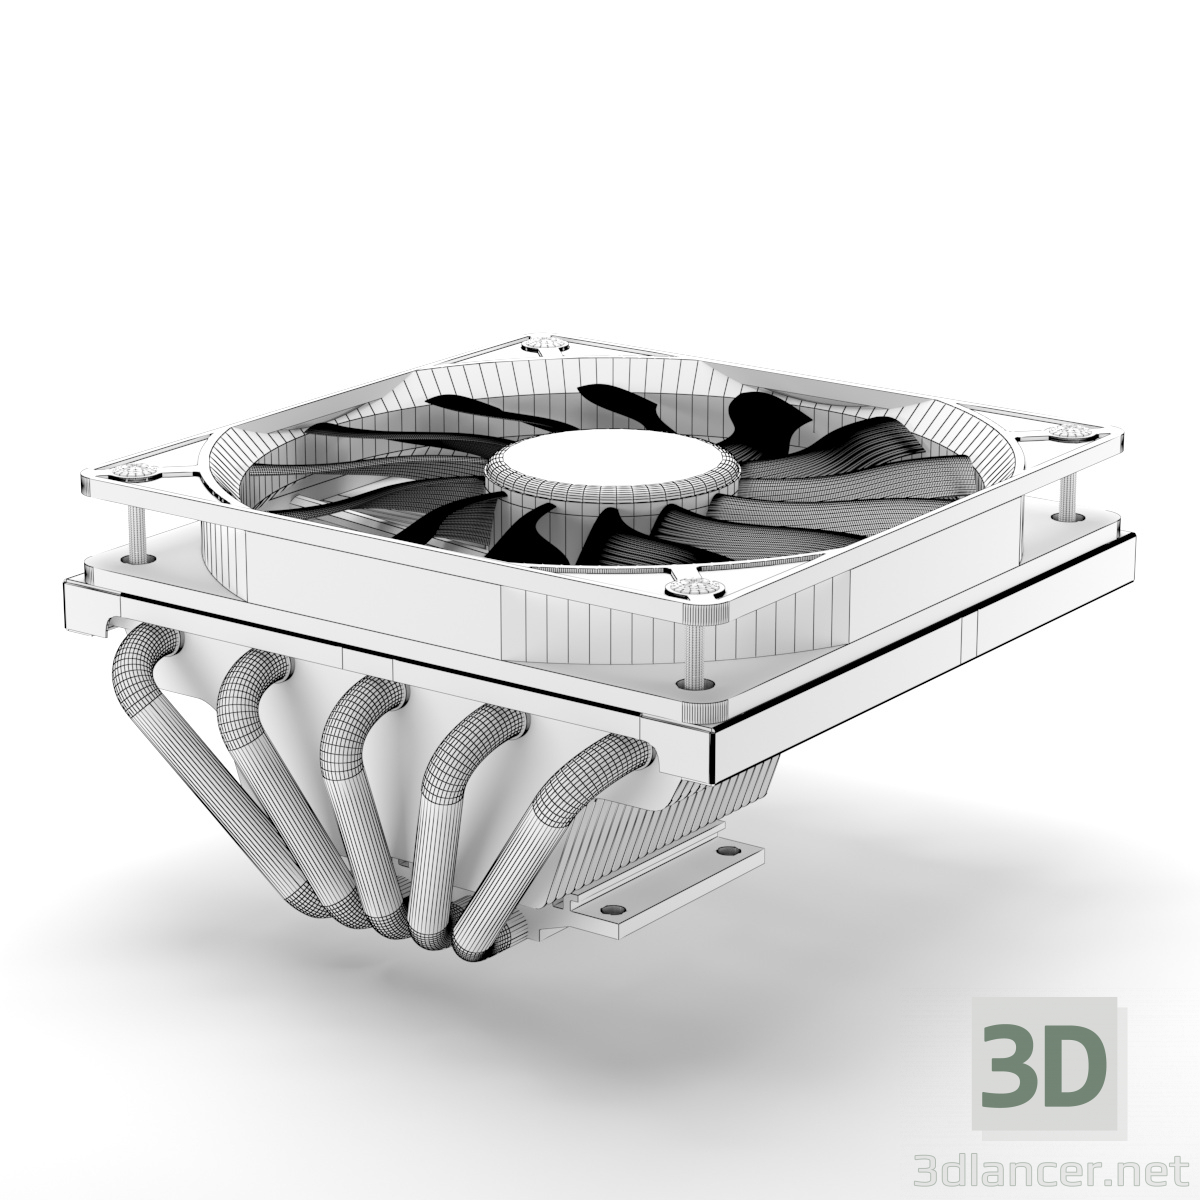 3d CoolerMaster GeminII M5 LED model buy - render